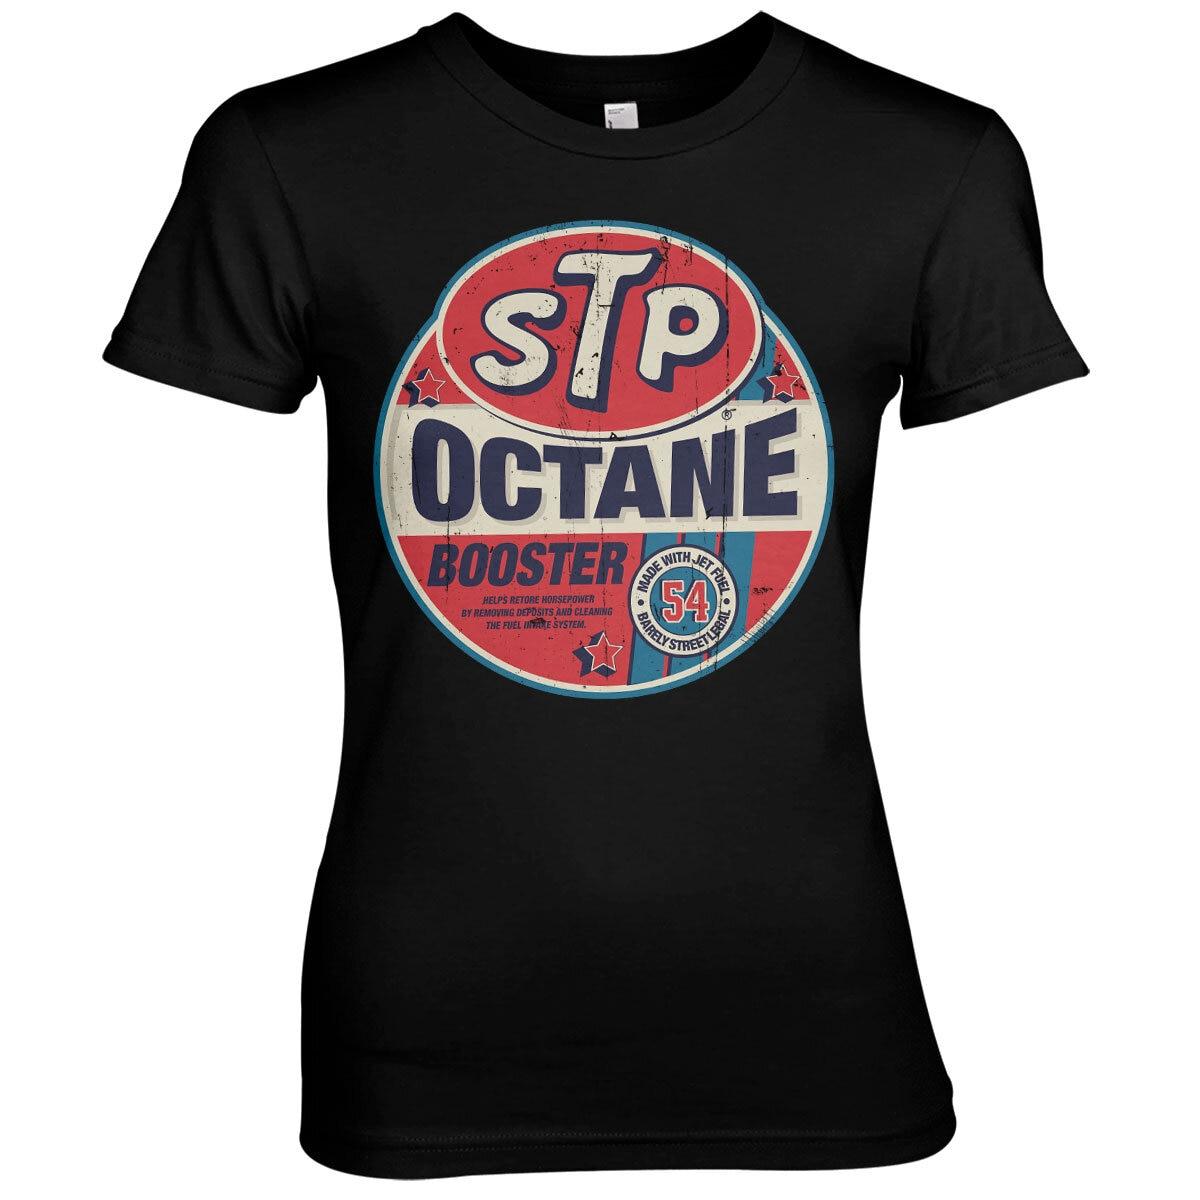 STP Octane Booster Girly Tee